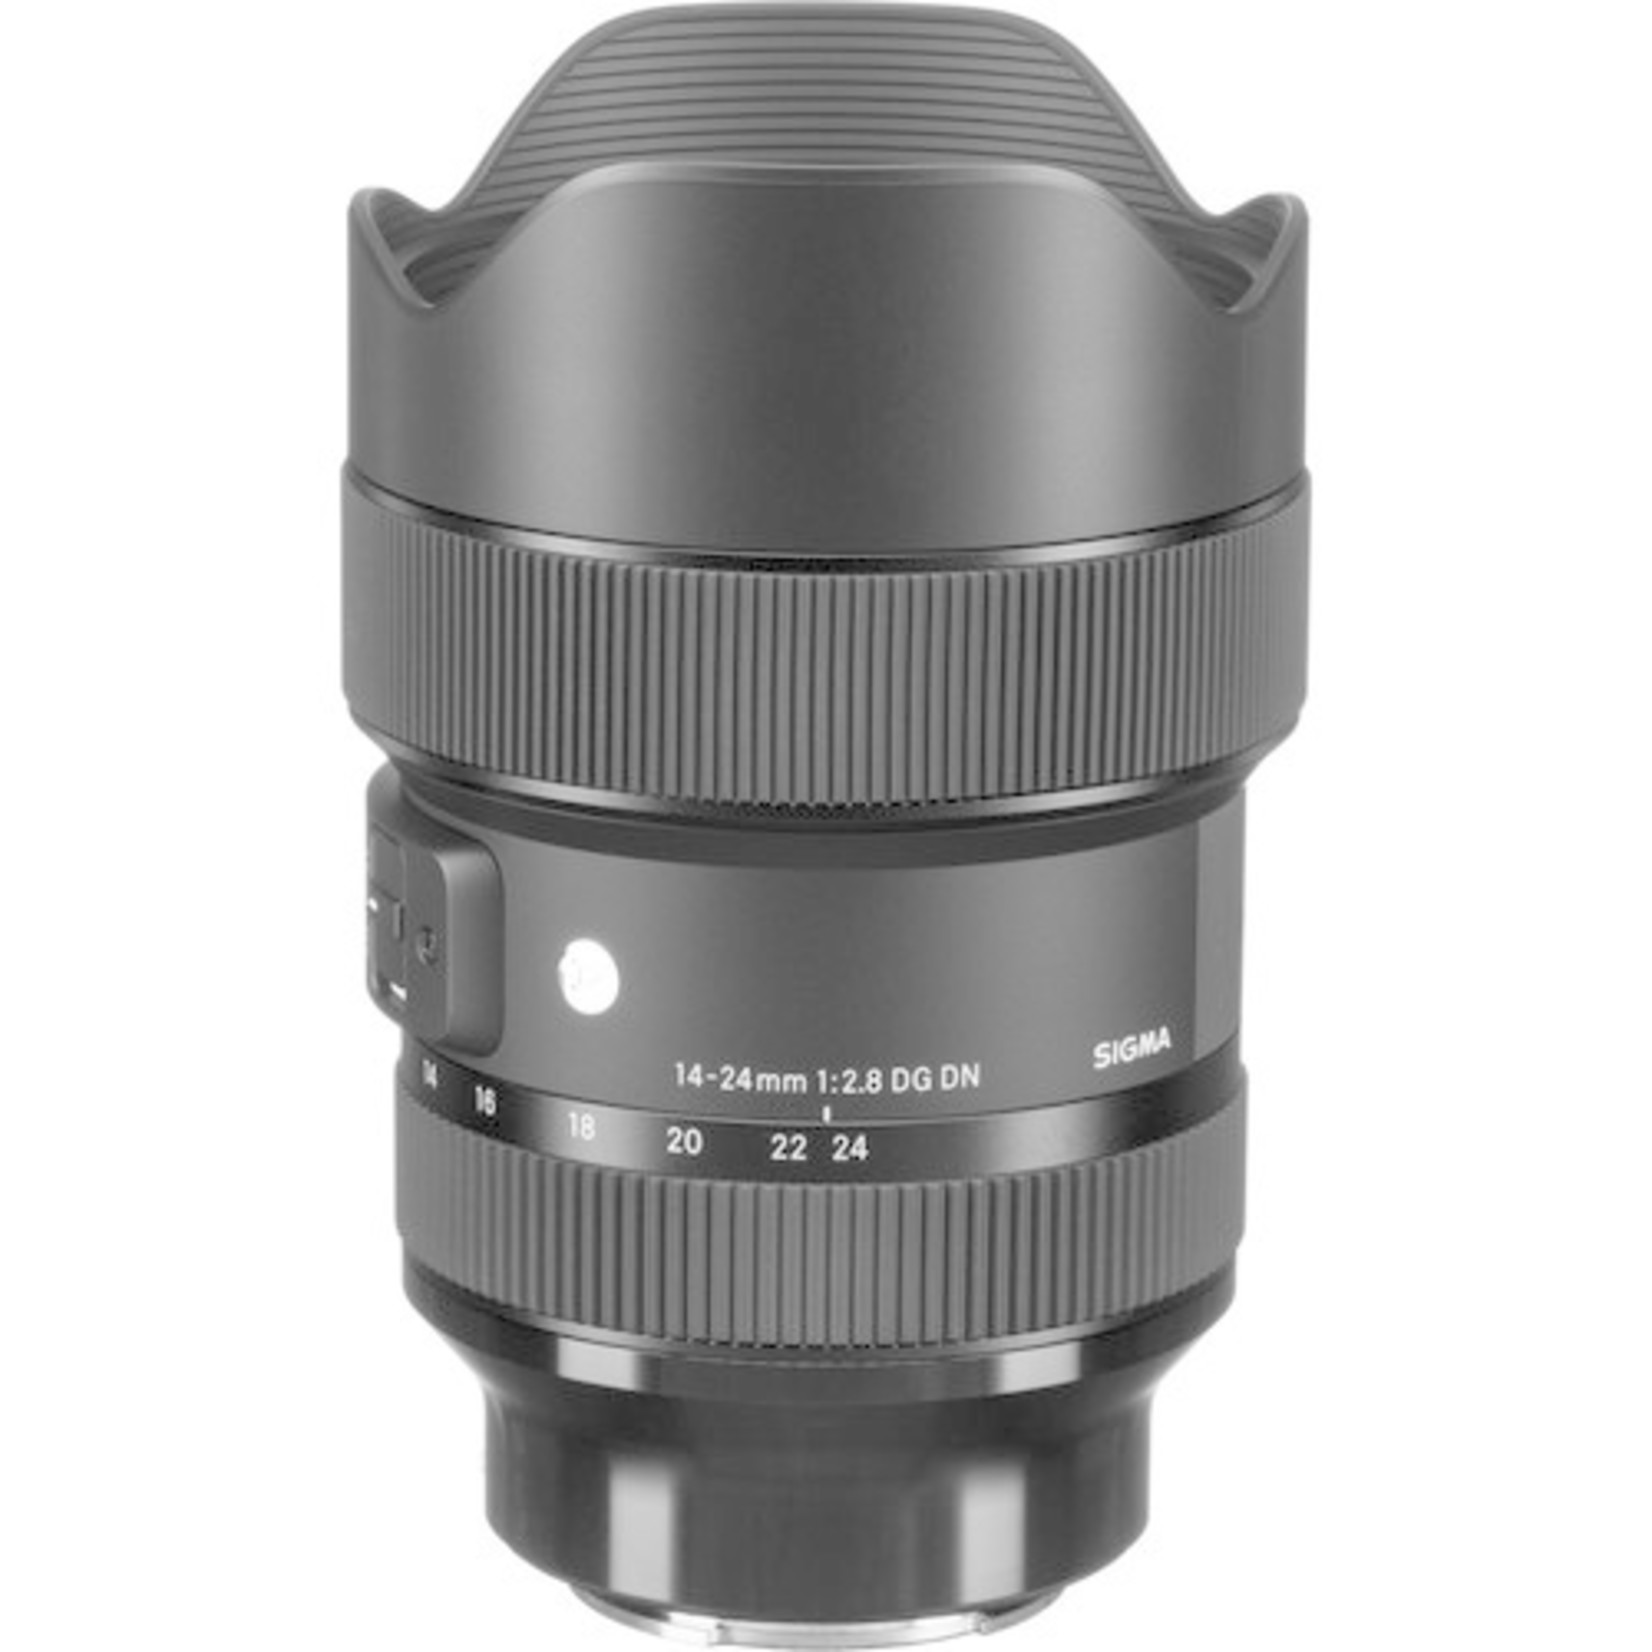 Sigma Sigma 14-24mm f/2.8 DG DN Art Lens for Sony E